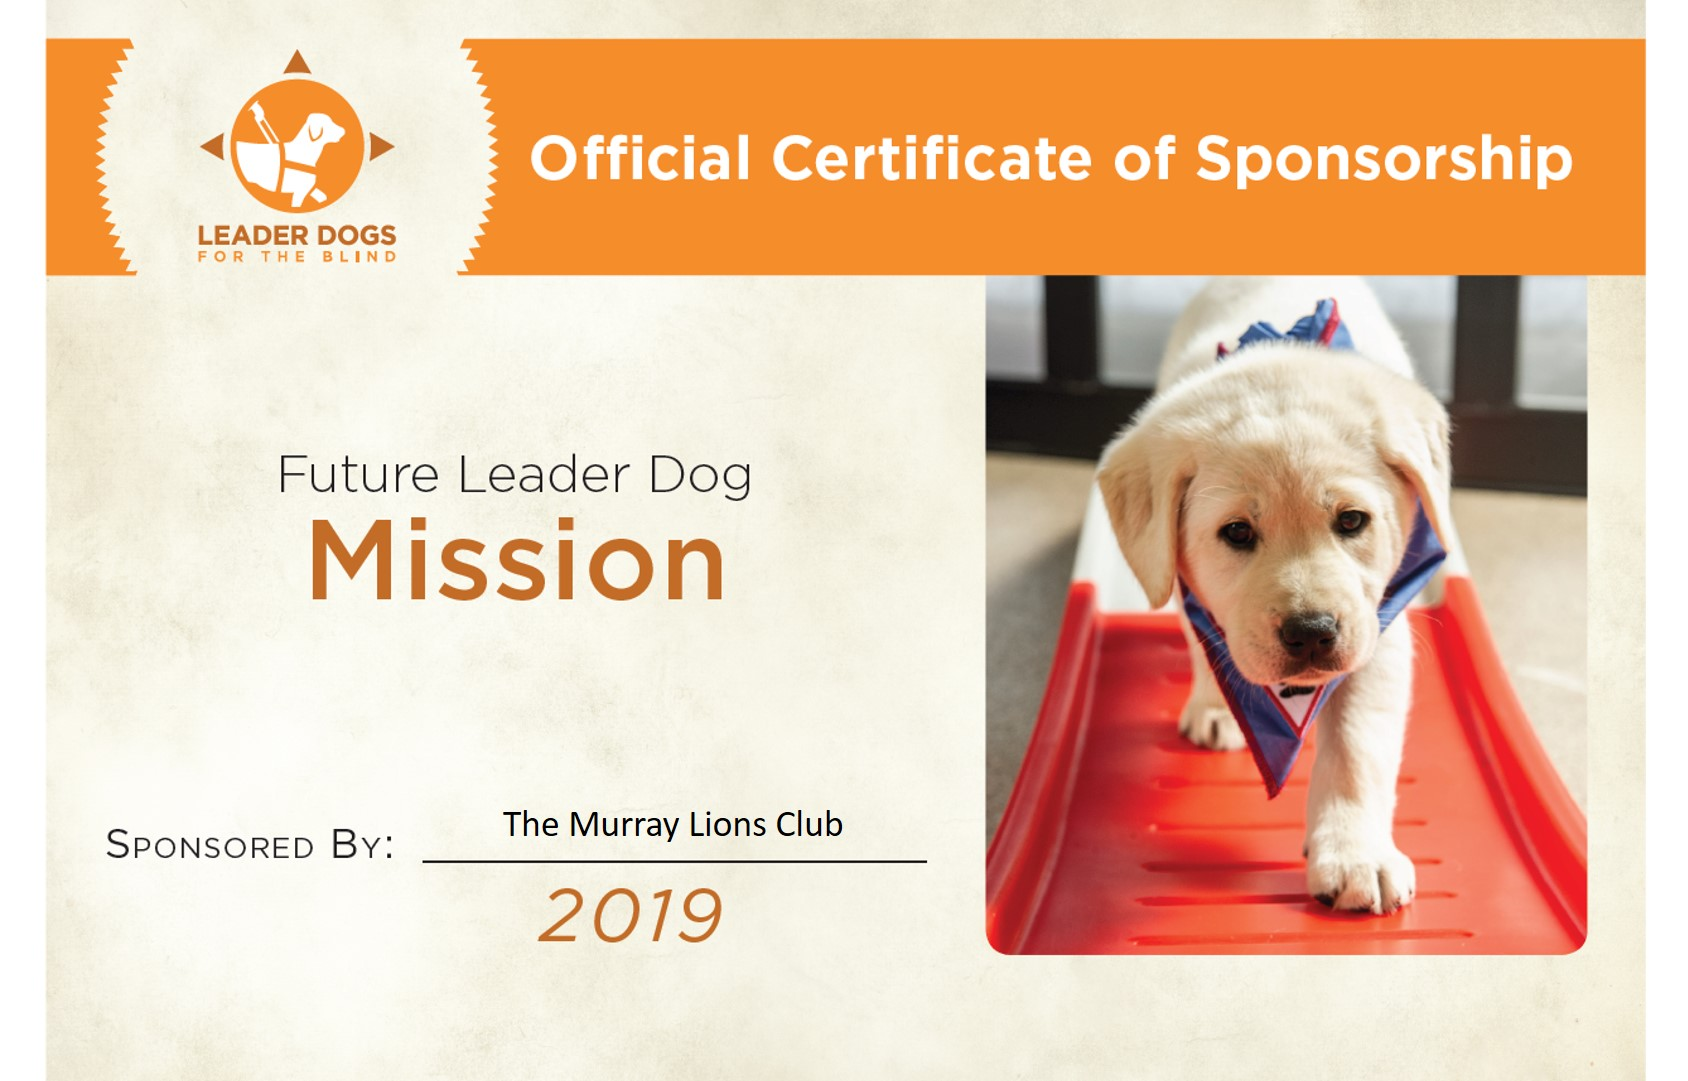 Mission Sponsorship